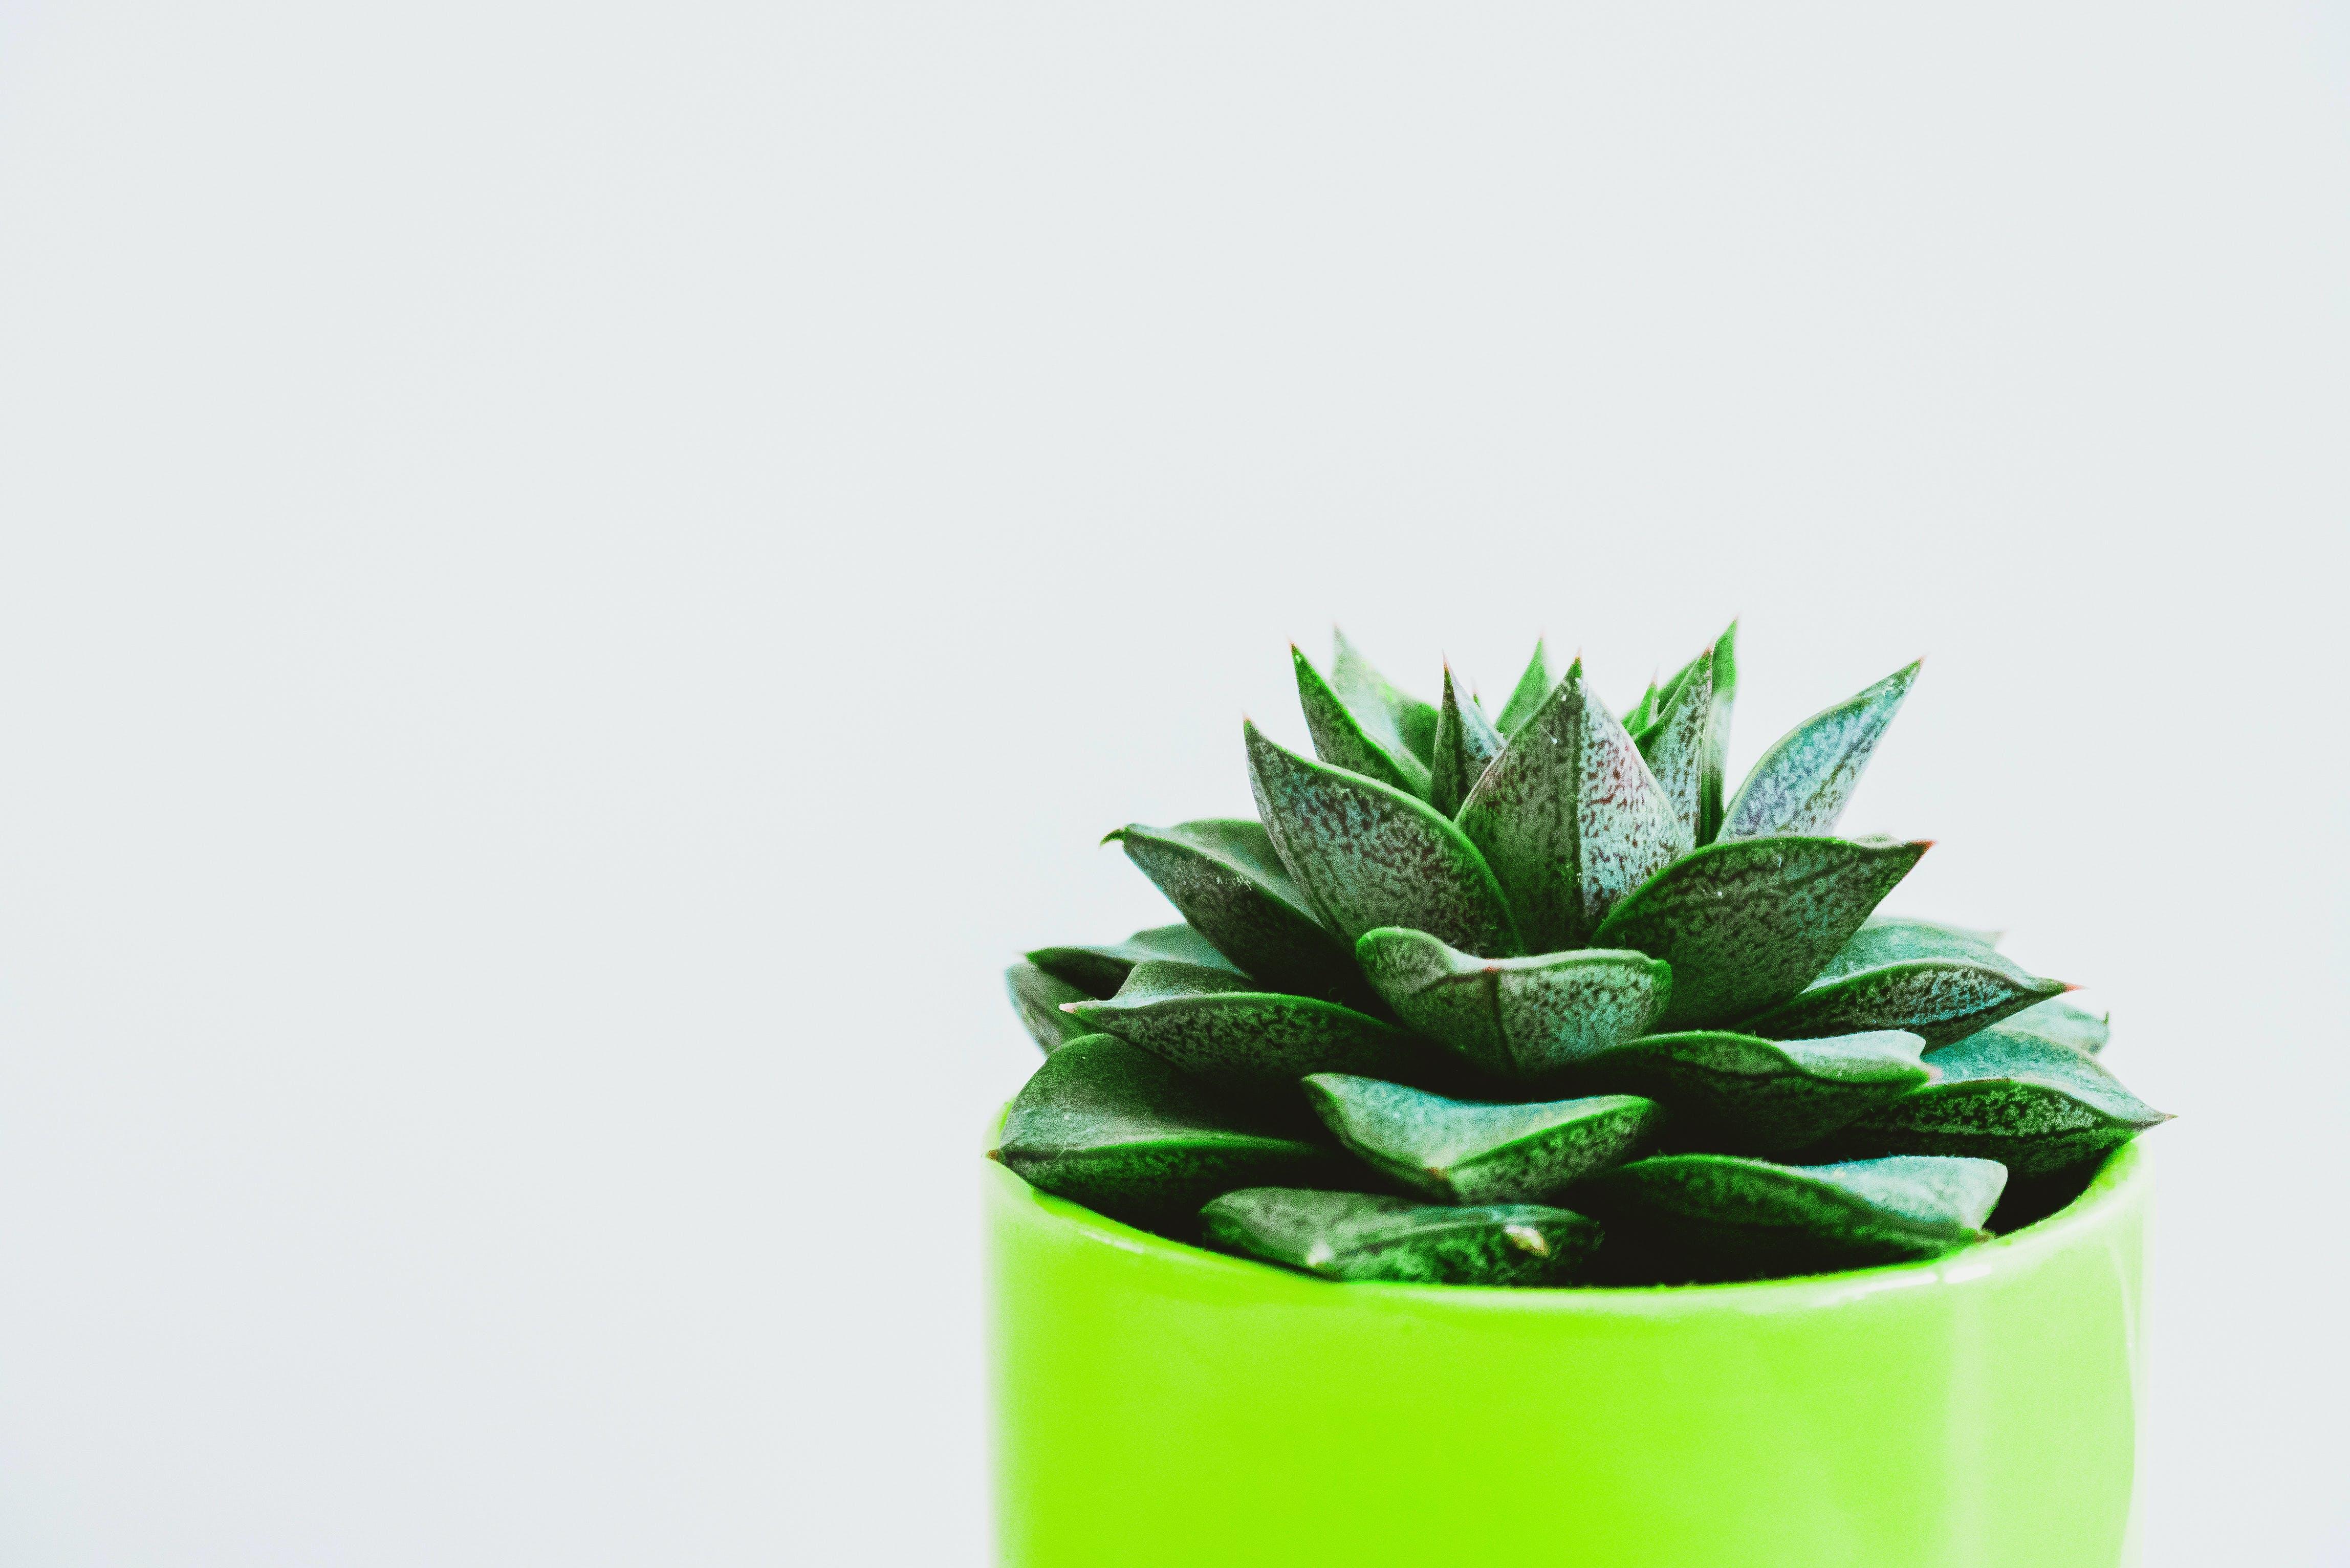 Gratis lagerfoto af Botanisk, flora, kaktus, kaktusplanter